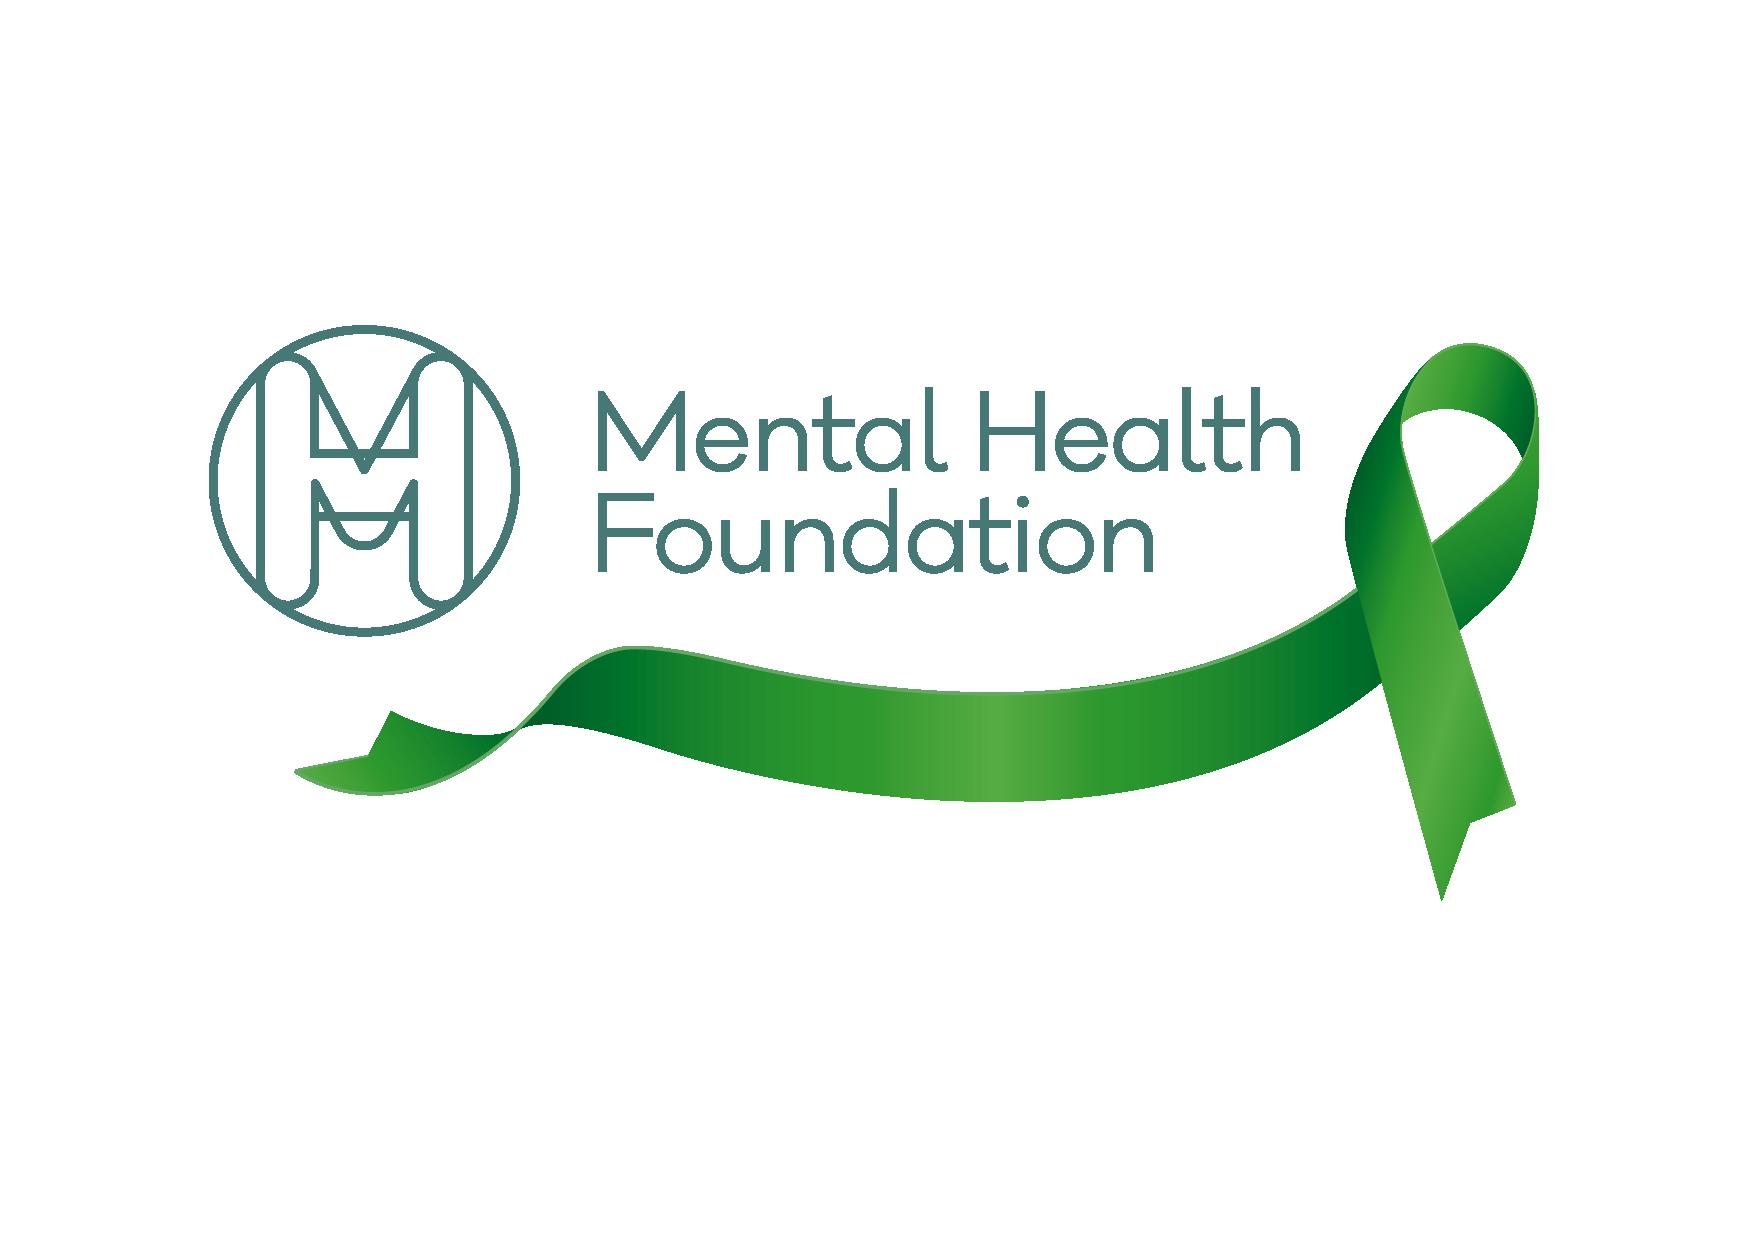 MHL logo green ribbon